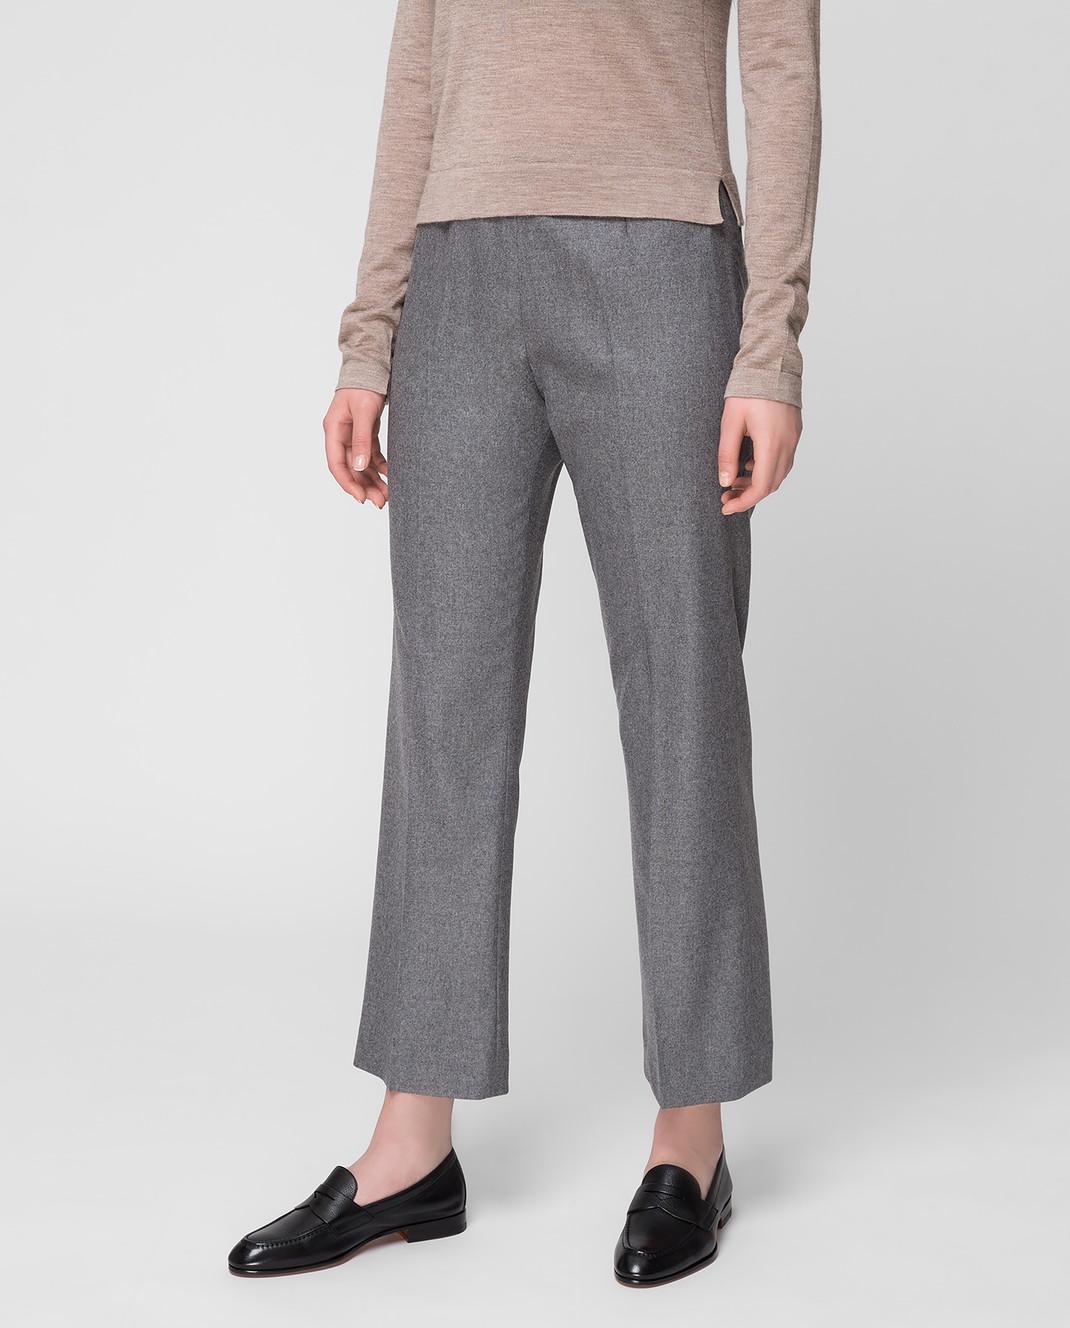 COLOMBO Серые брюки PA0032661088 изображение 3